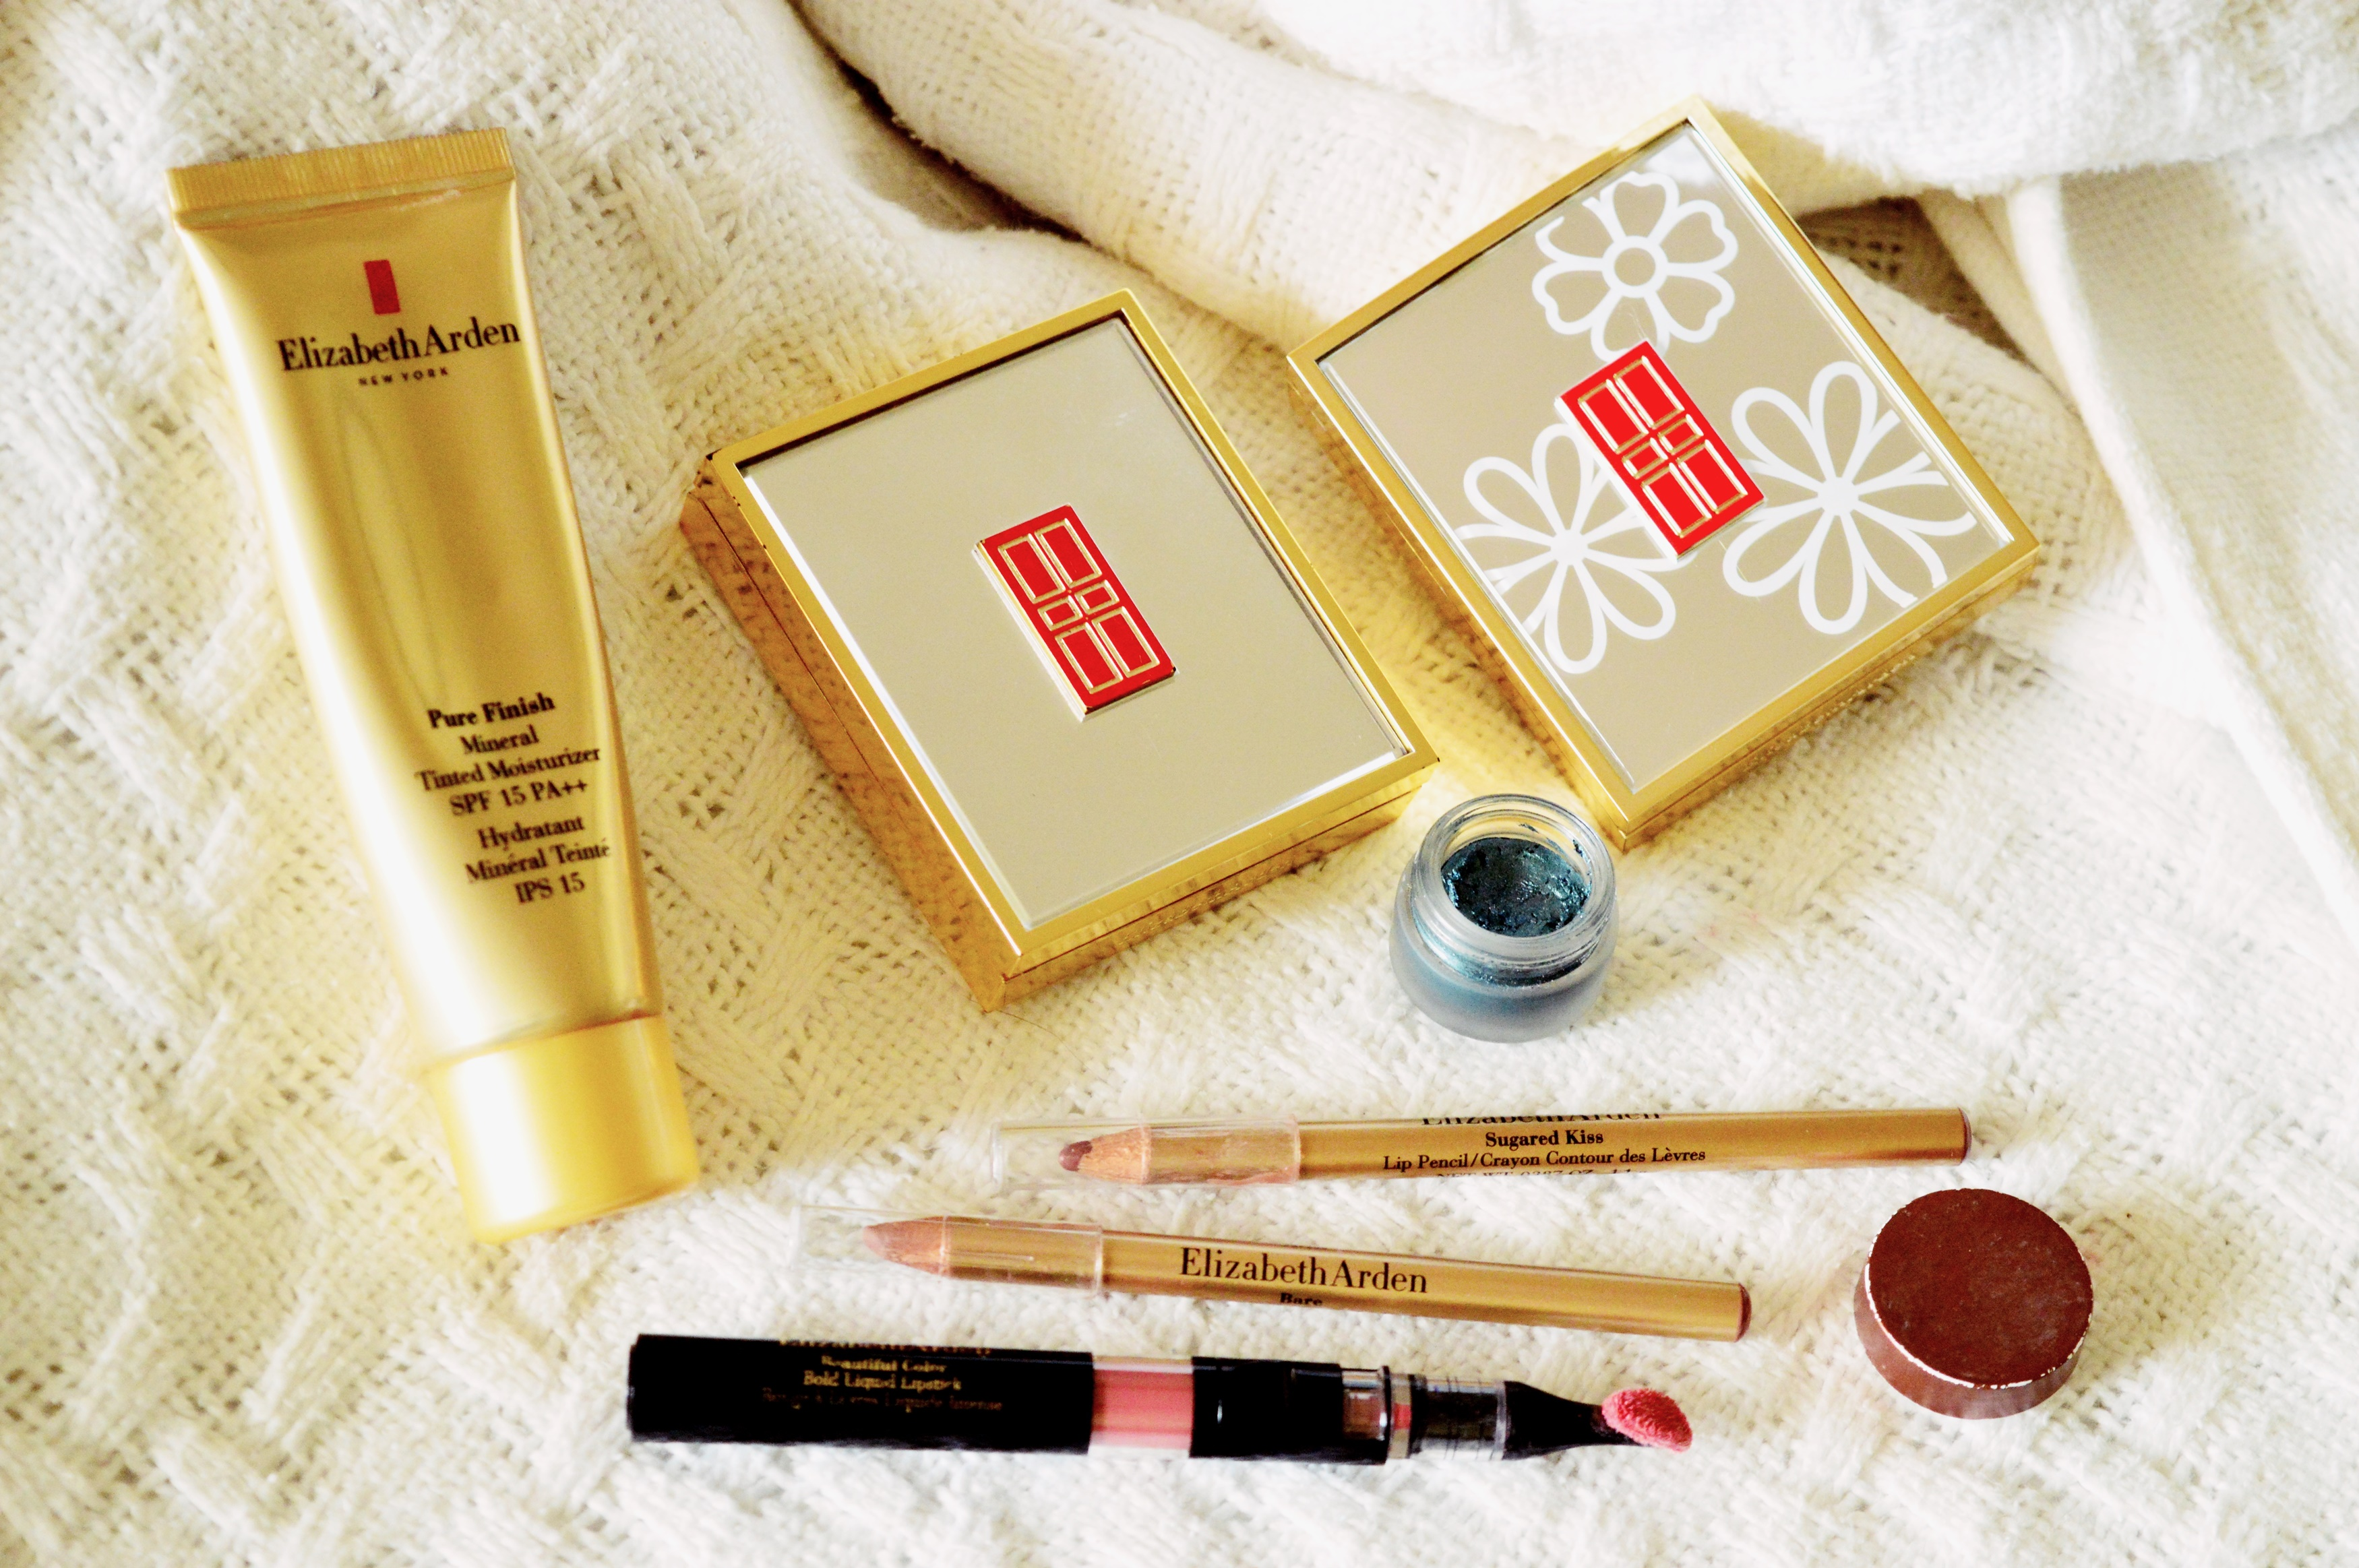 My ultimate make-up picks from Elizabeth Arden {SERIES}